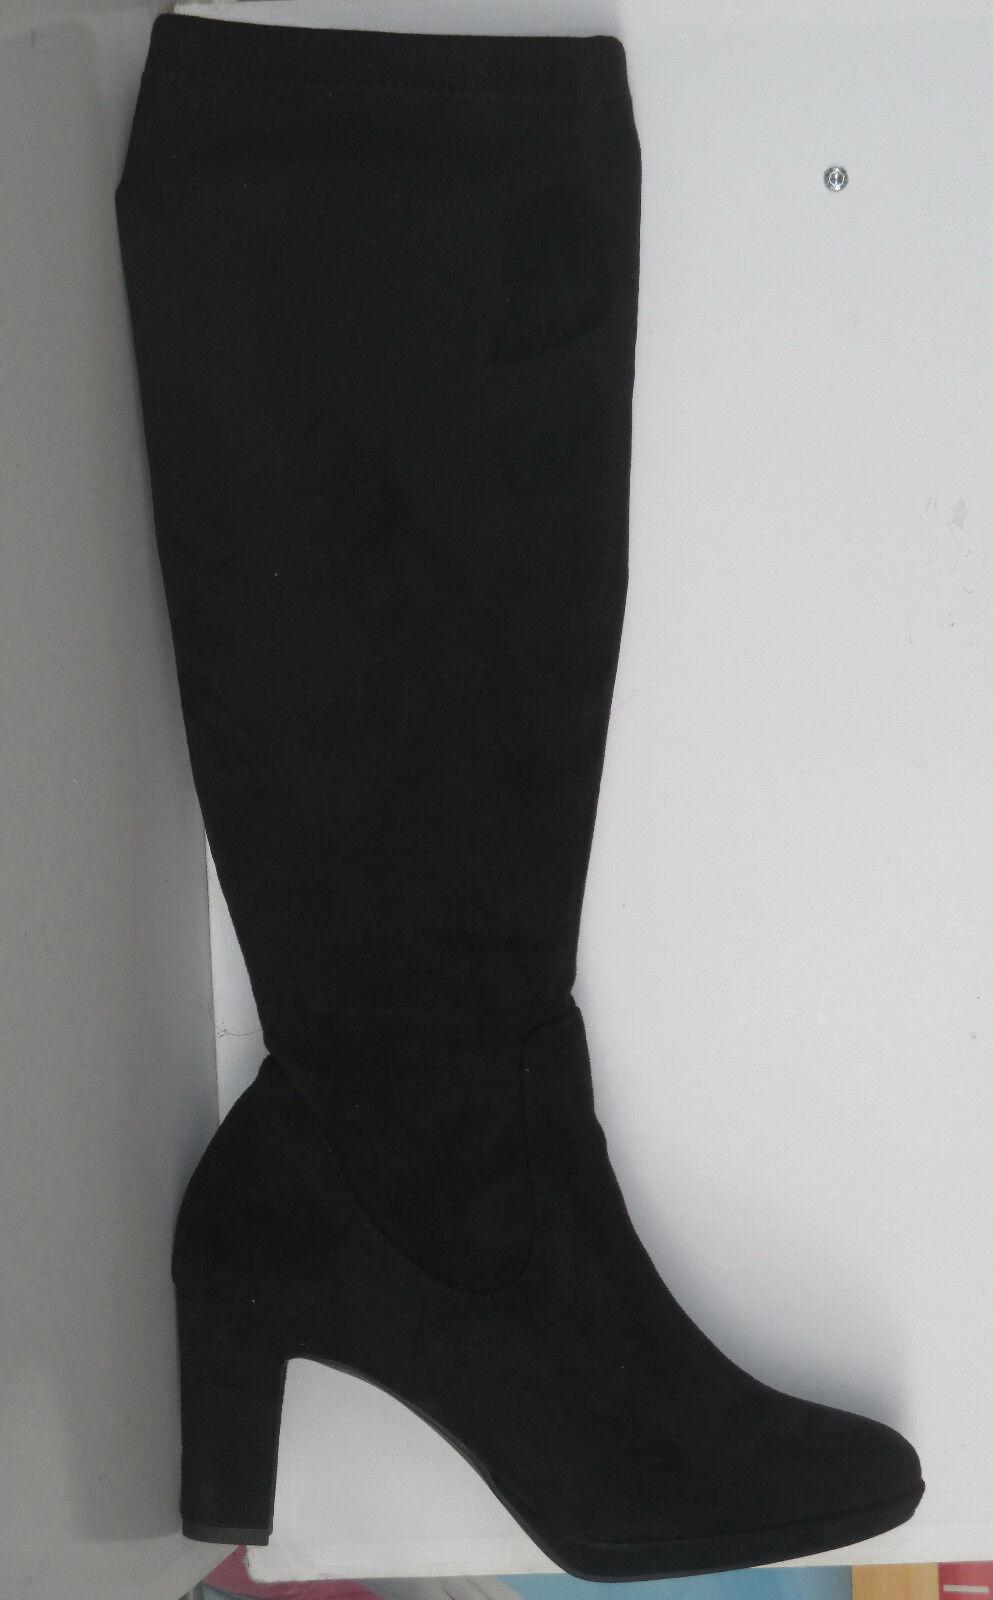 Art. 36 40, Gr. , STRETCH Stiefel, Damen Schuhe Tamaris 1